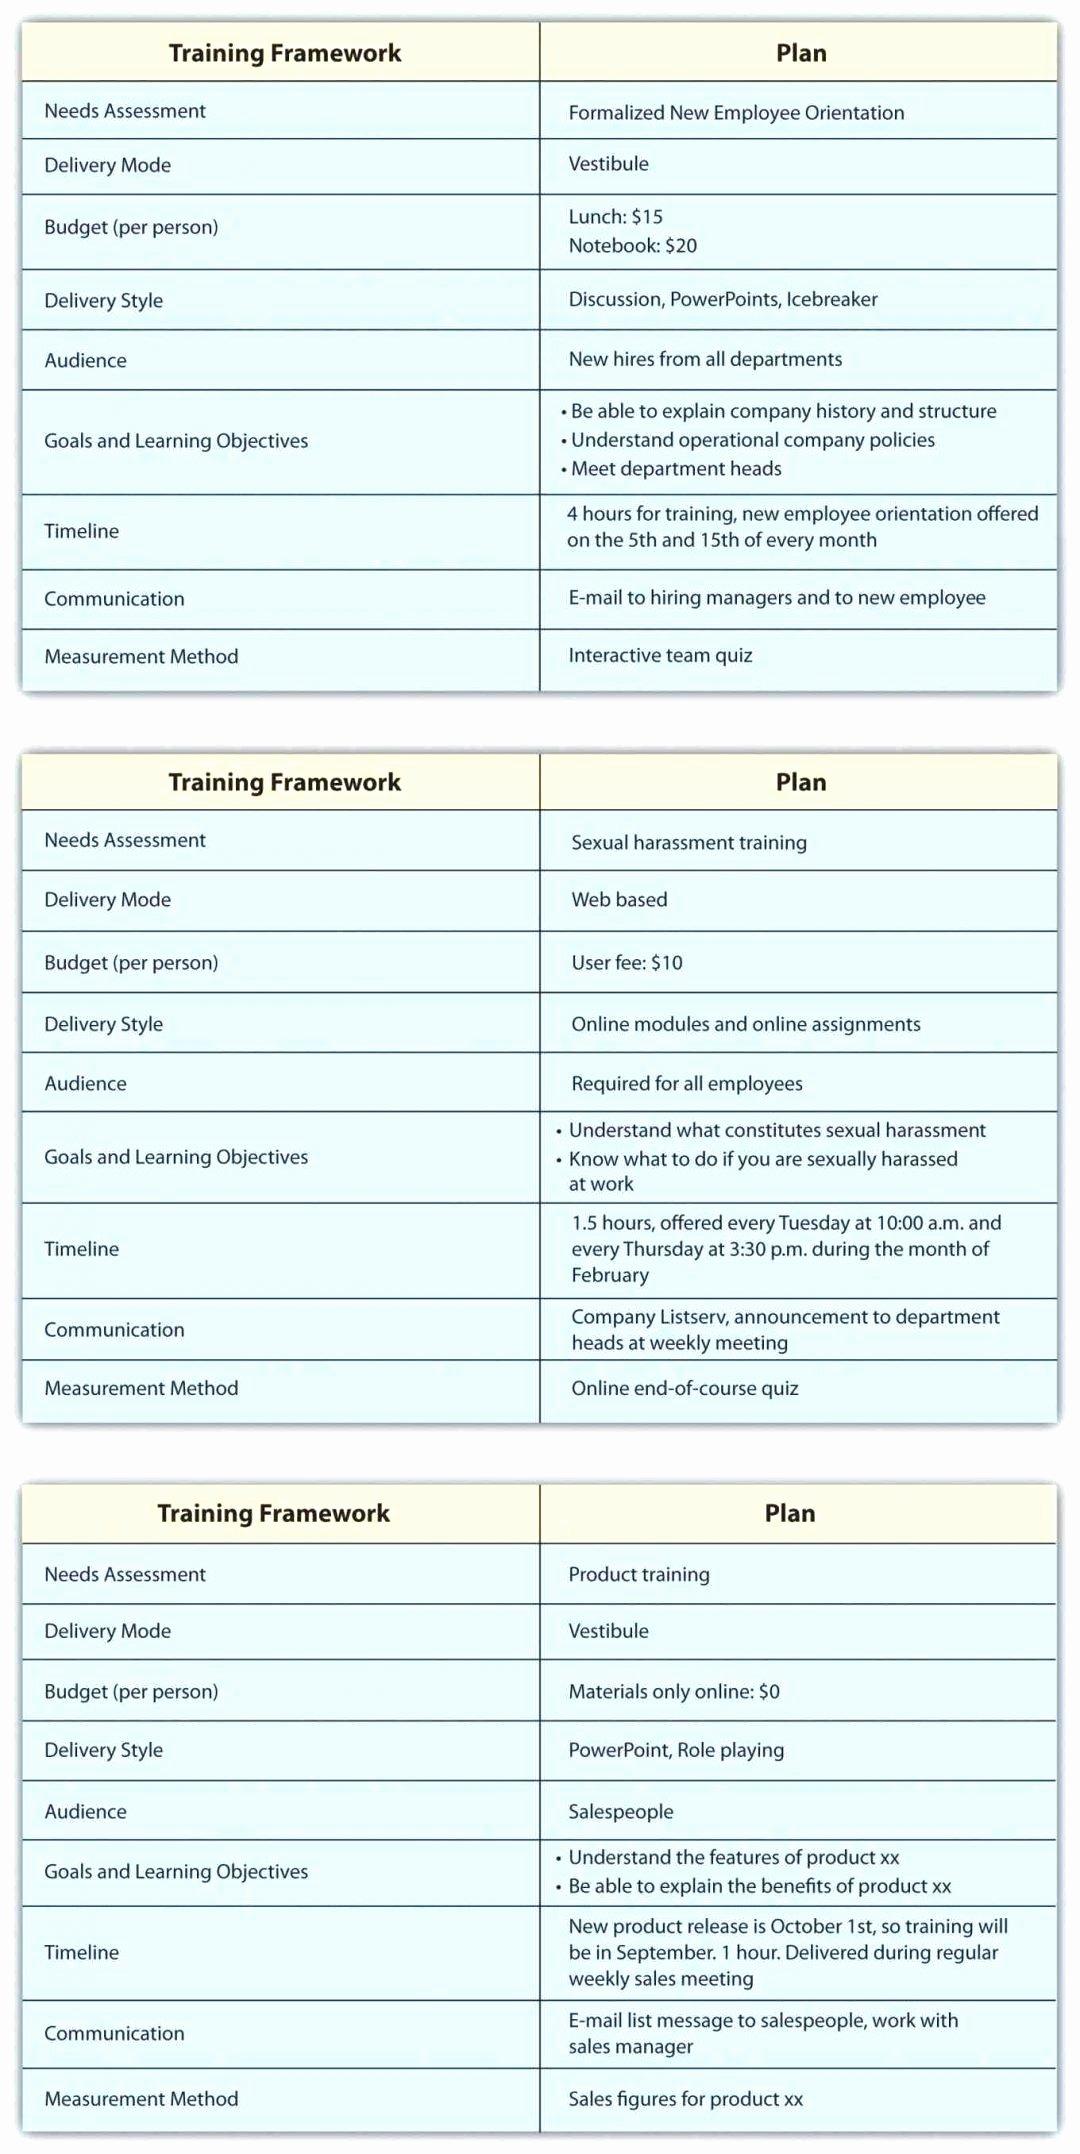 New Employee Training Plan Template Best Of Template New Employee Training Checklist Template